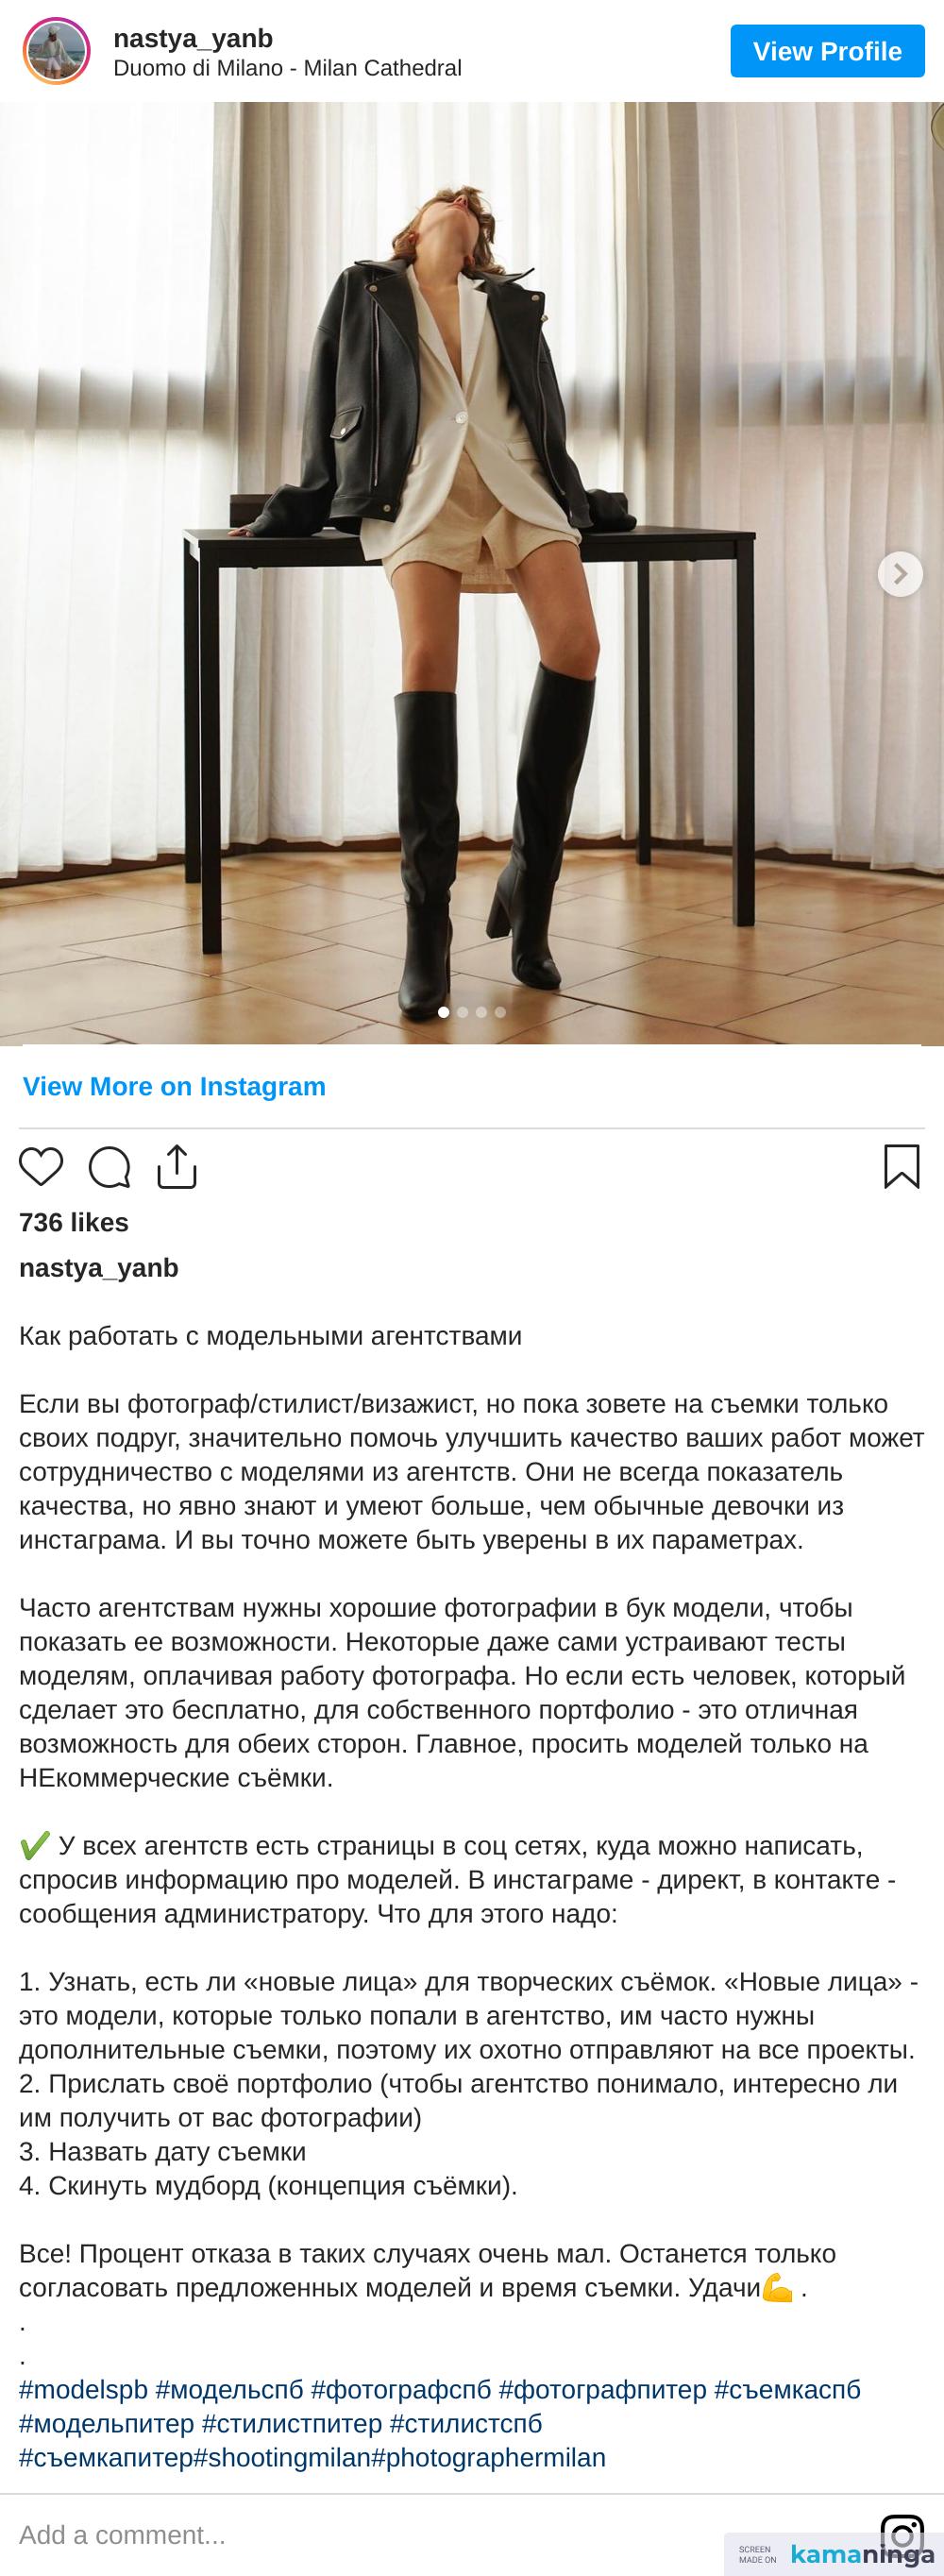 https://www.instagram.com/p/B6l3sRJI9PX/